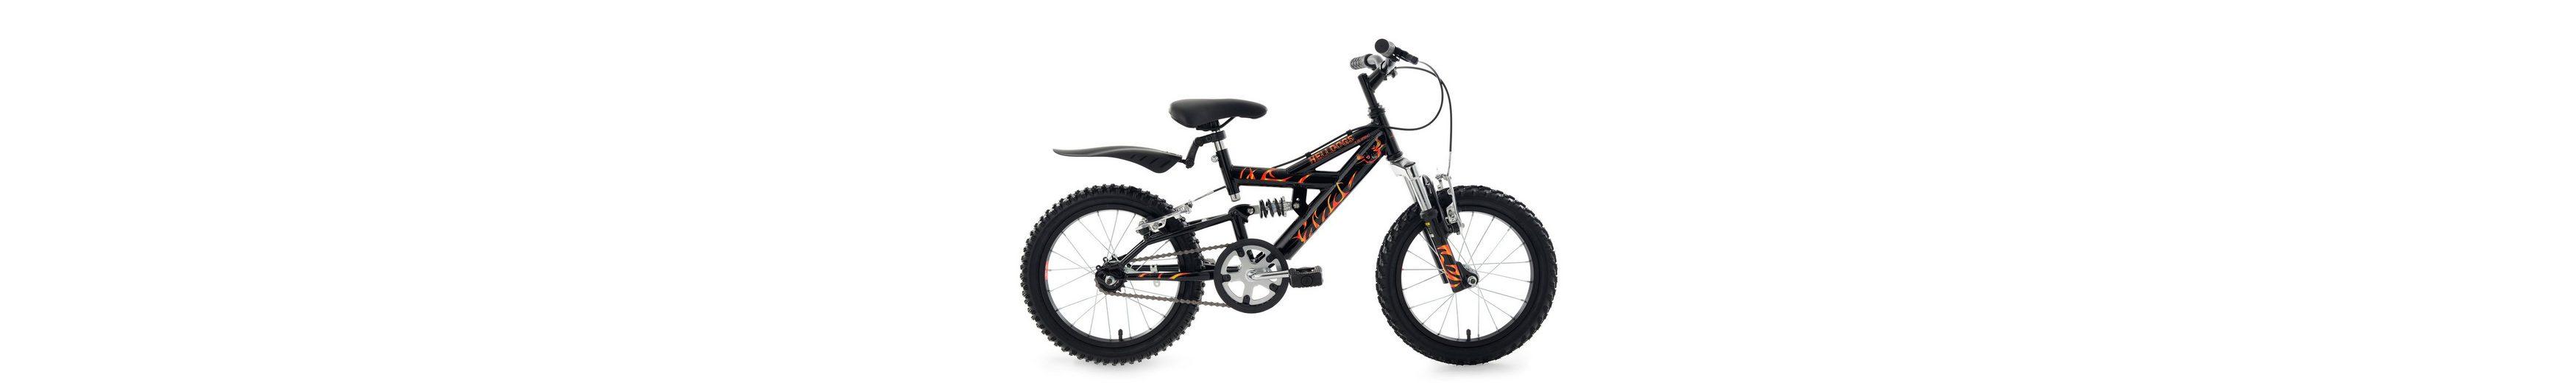 Kinderfahrrad, MTB, KS Cycling, »Helldogs«, 16 Zoll, schwarz, ohne Schaltung, Rücktritt